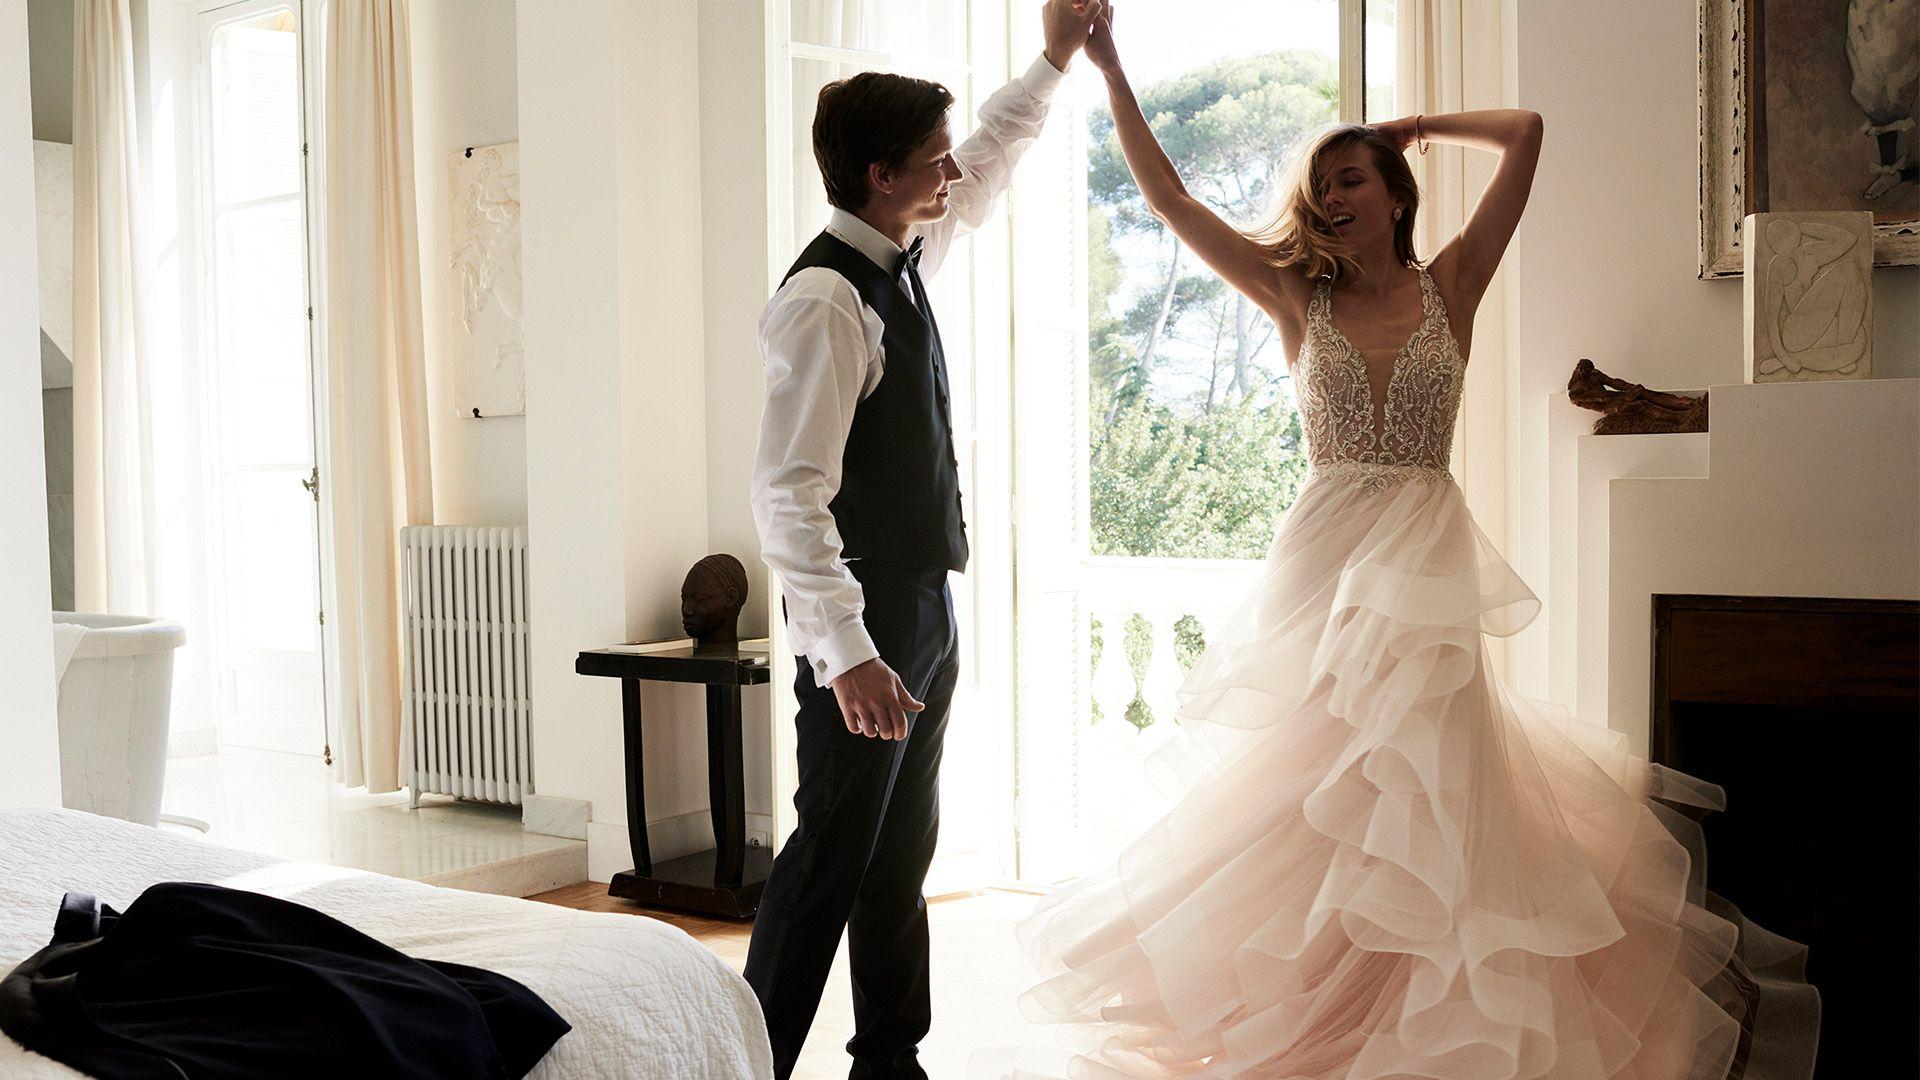 - Model 88059: Romantic Ruffle Skirt Ball Gown